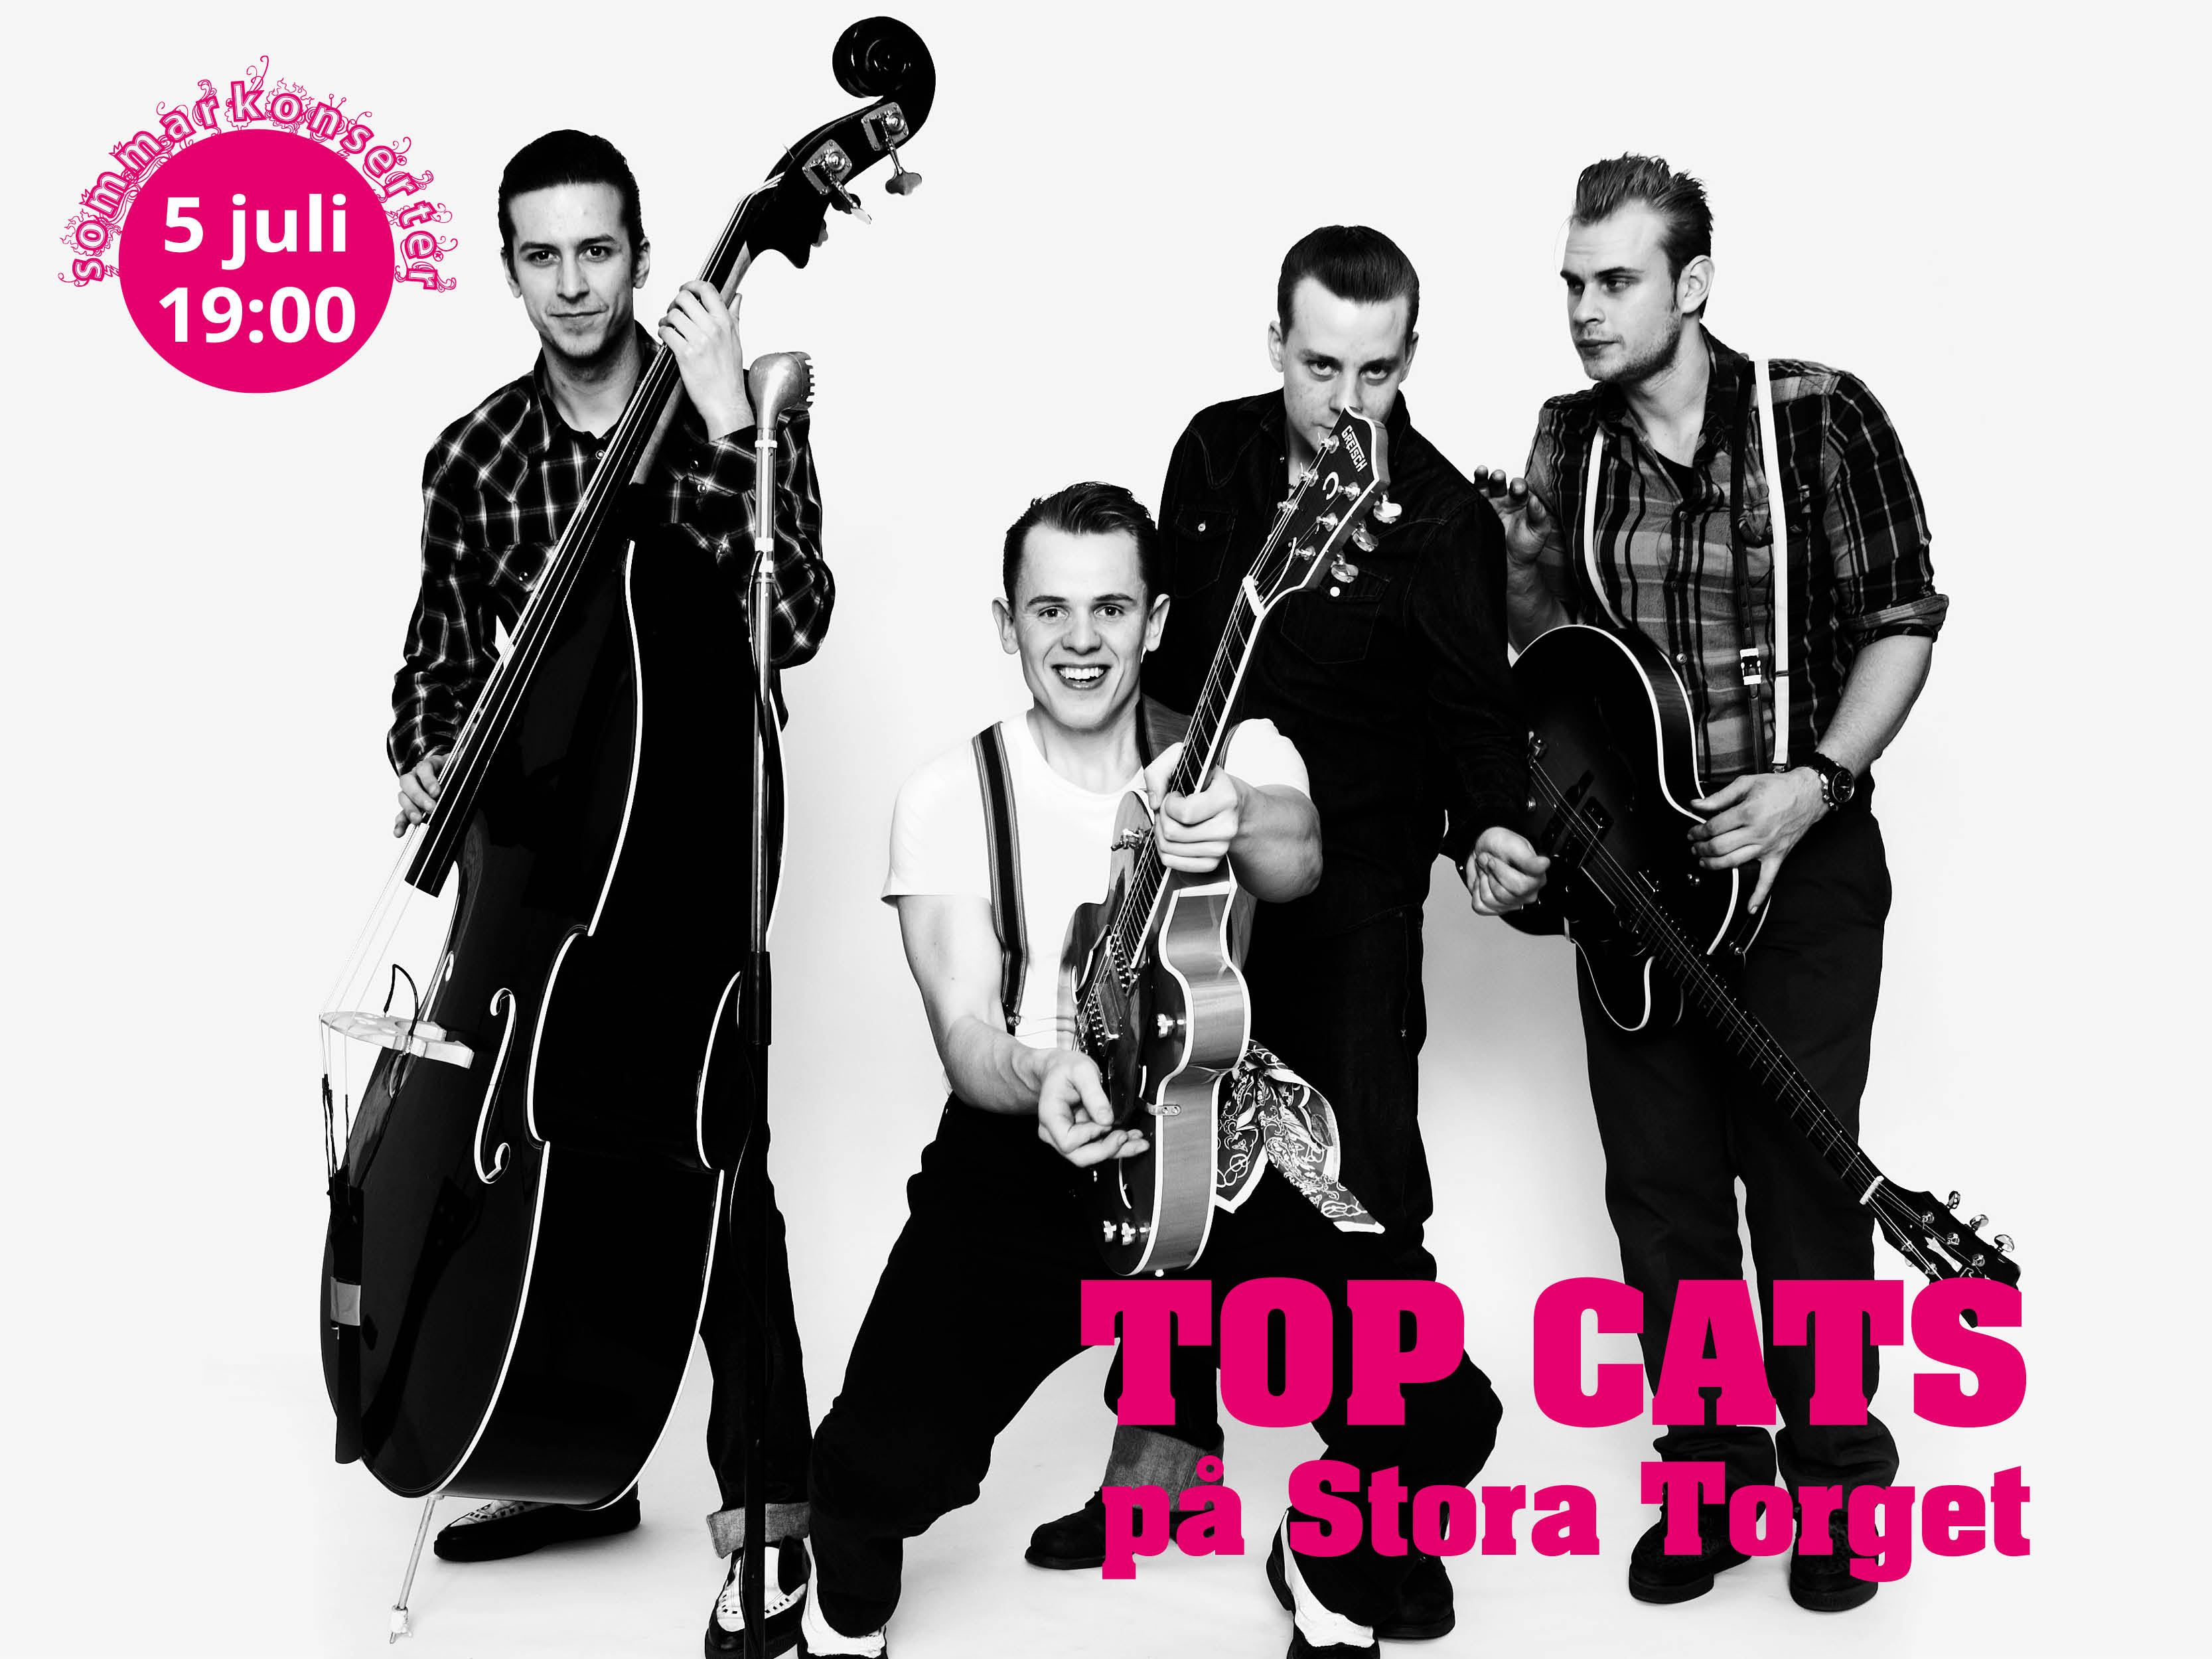 Sommarkonsert - Top Cats